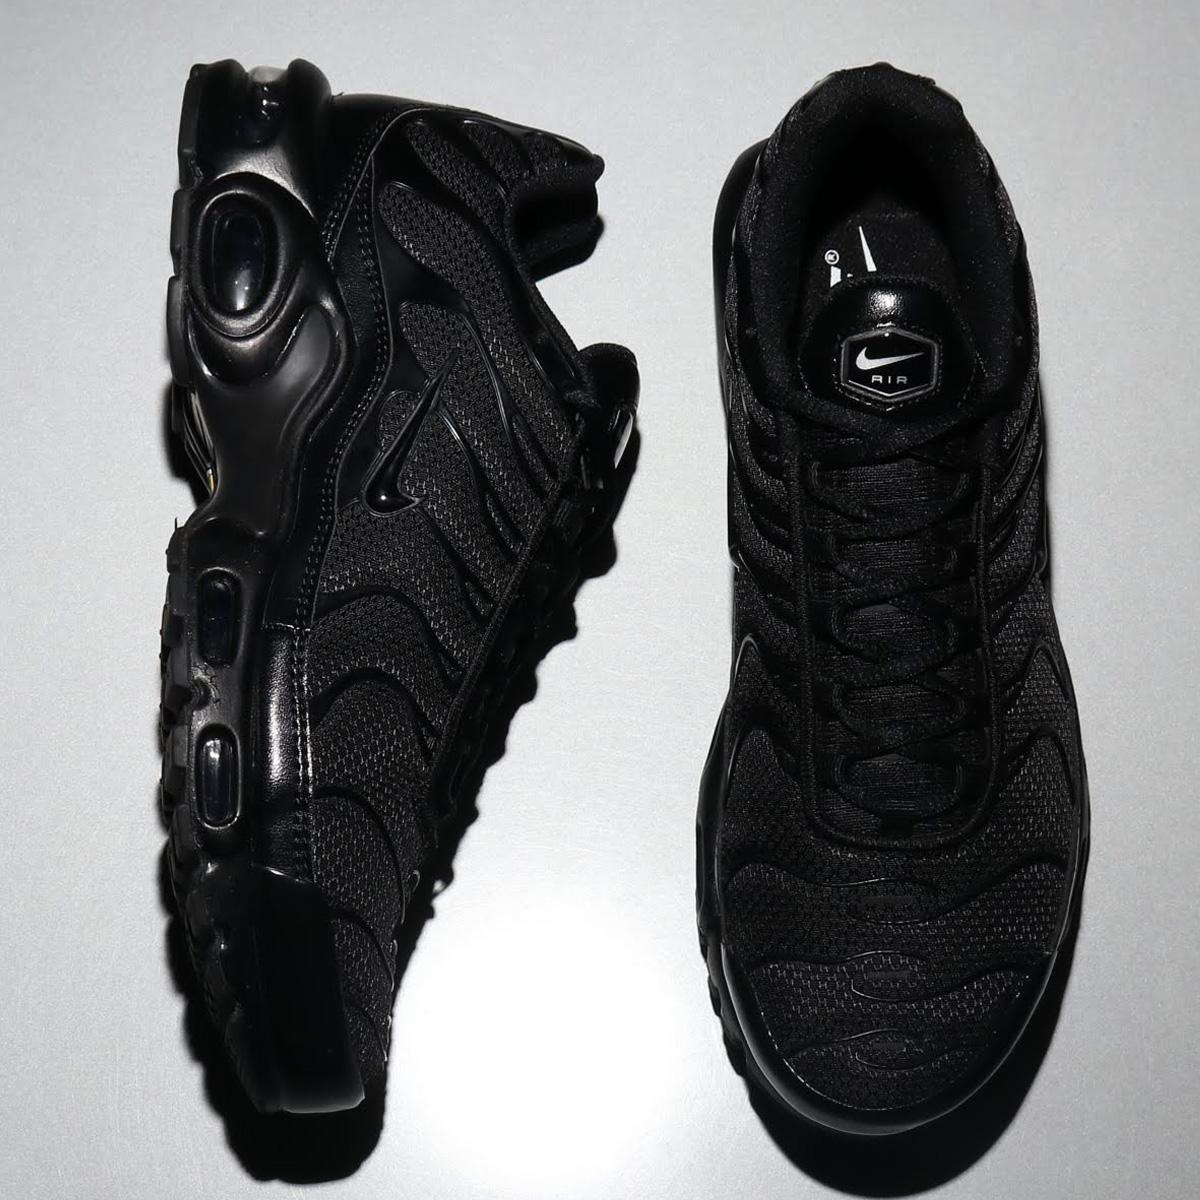 NIKE AIR MAX PLUS(ナイキ エア マックス プラス)BLACK/BLACK-BLACK【メンズ レディース スニーカー】19HO-I